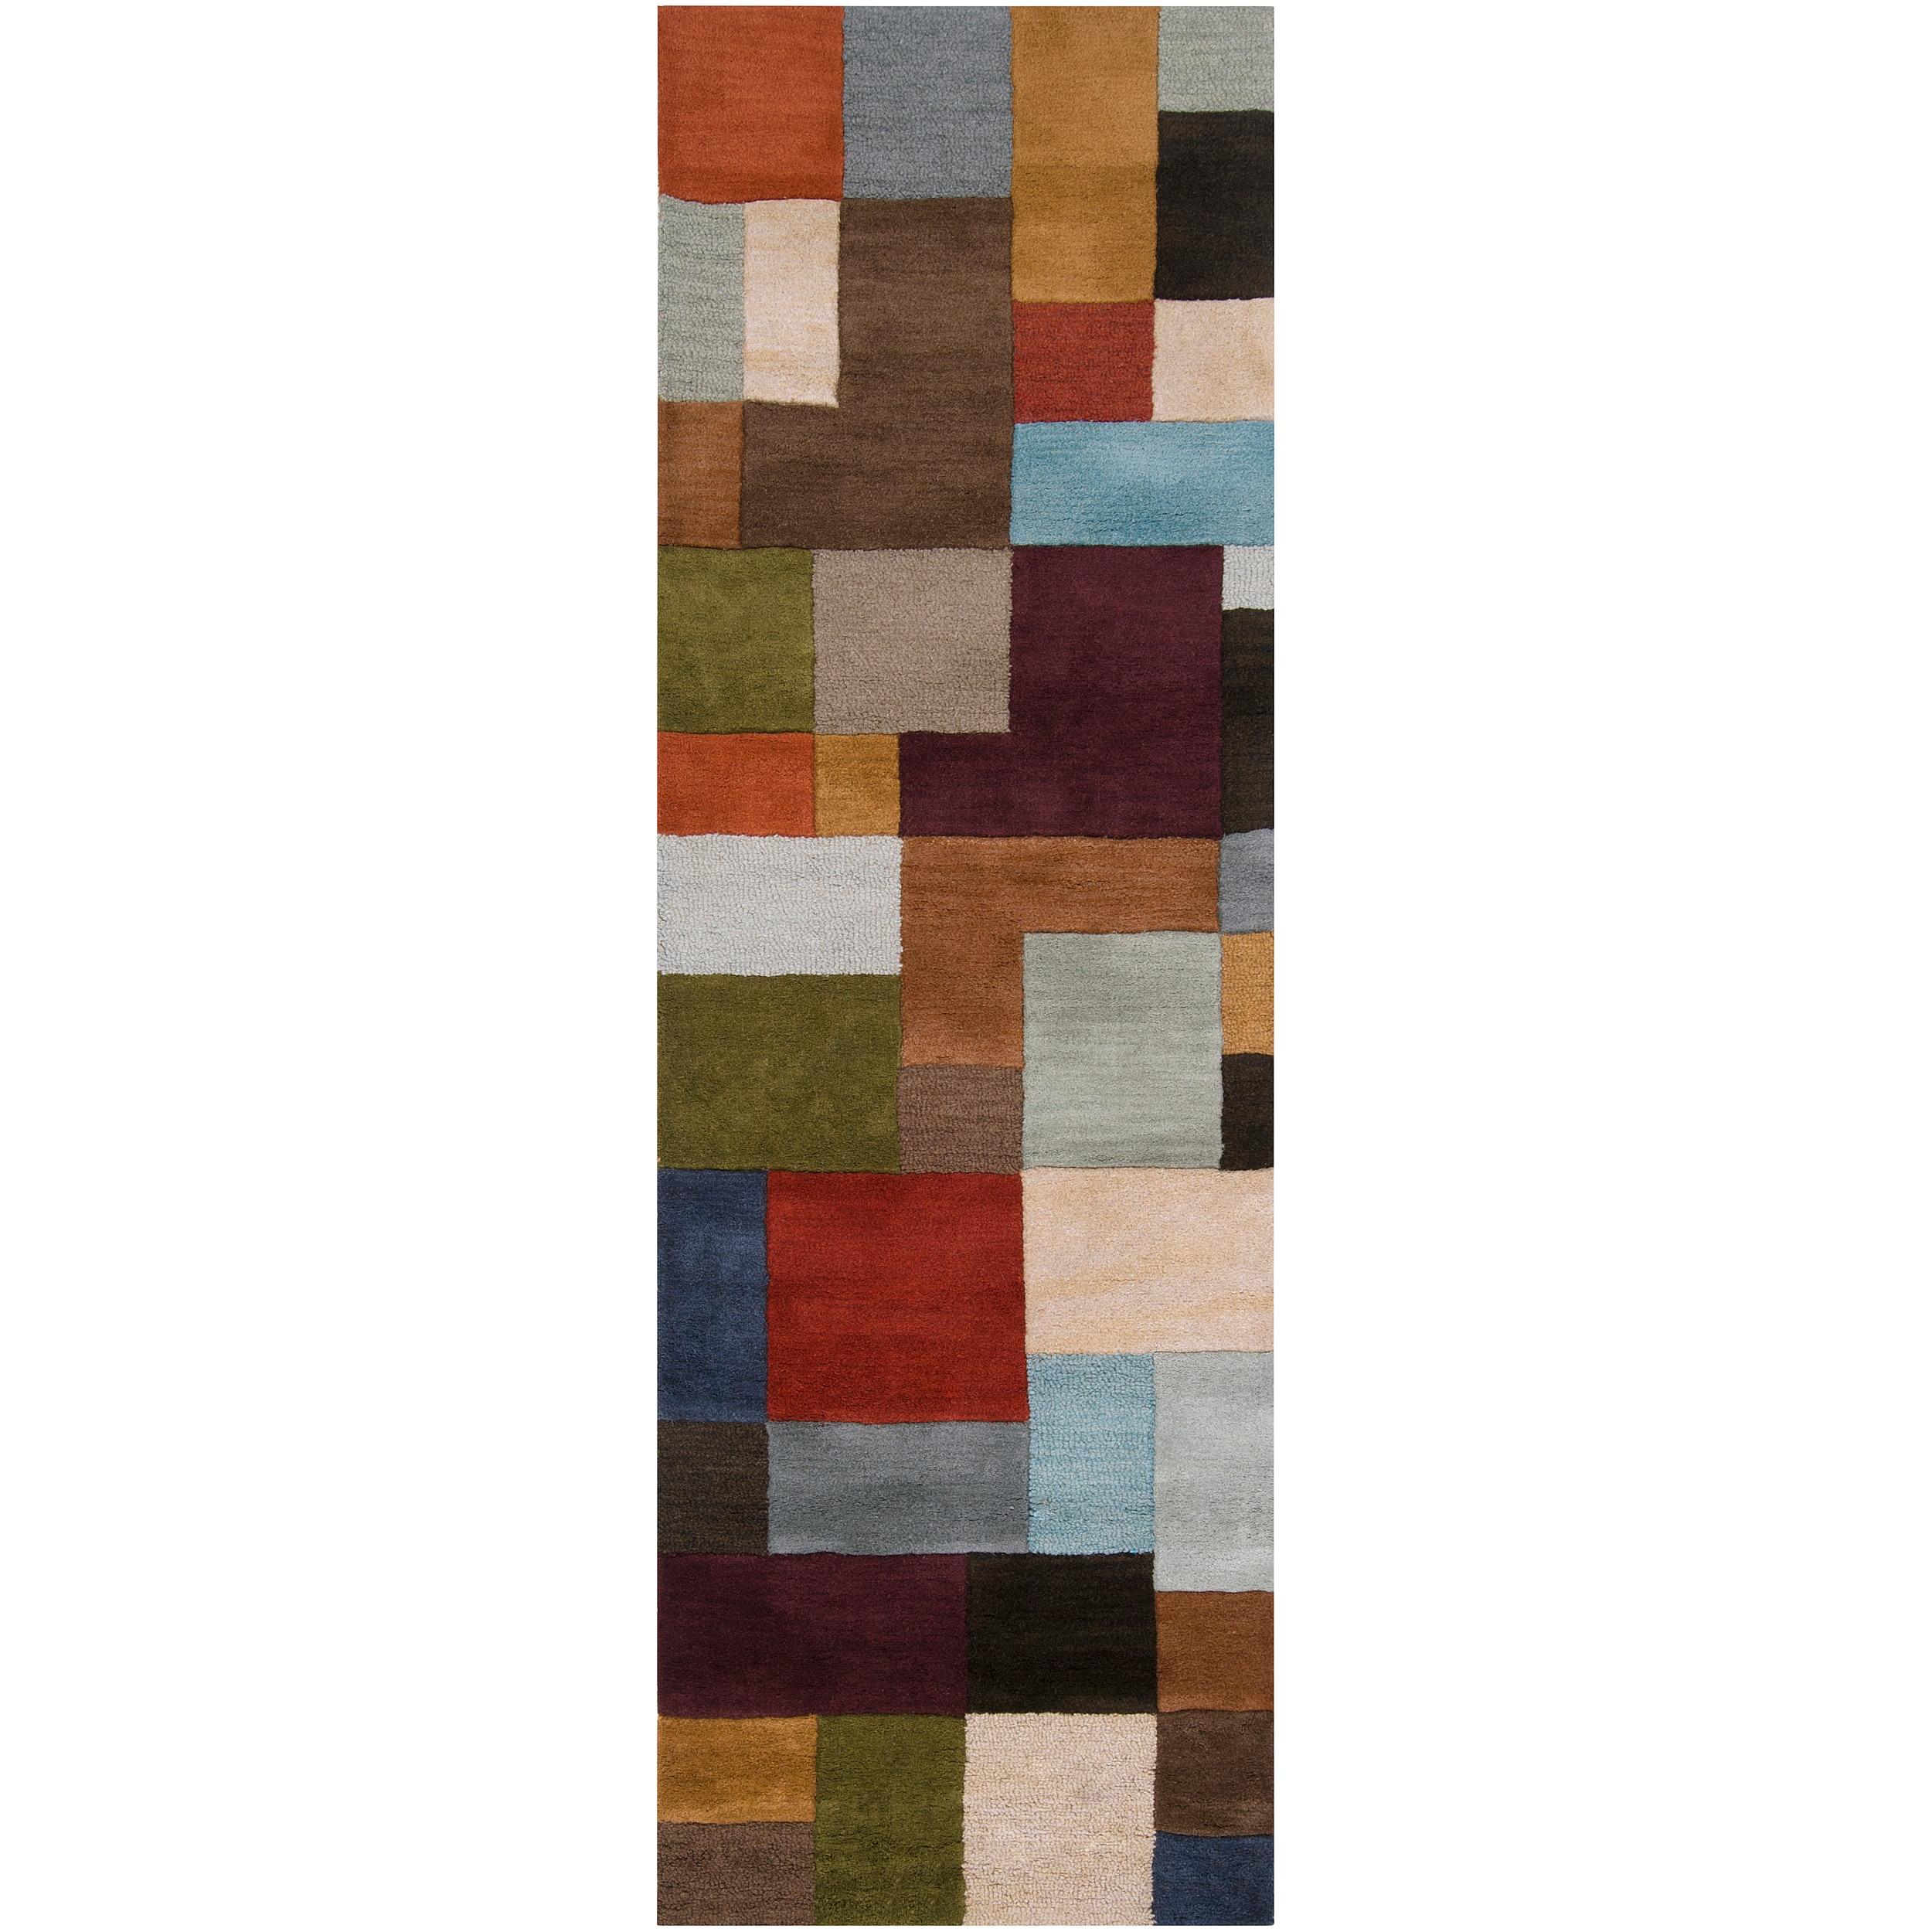 Hand-tufted Tan Oakland Avenue A Geometric Wool Rug (2'6 x 8')